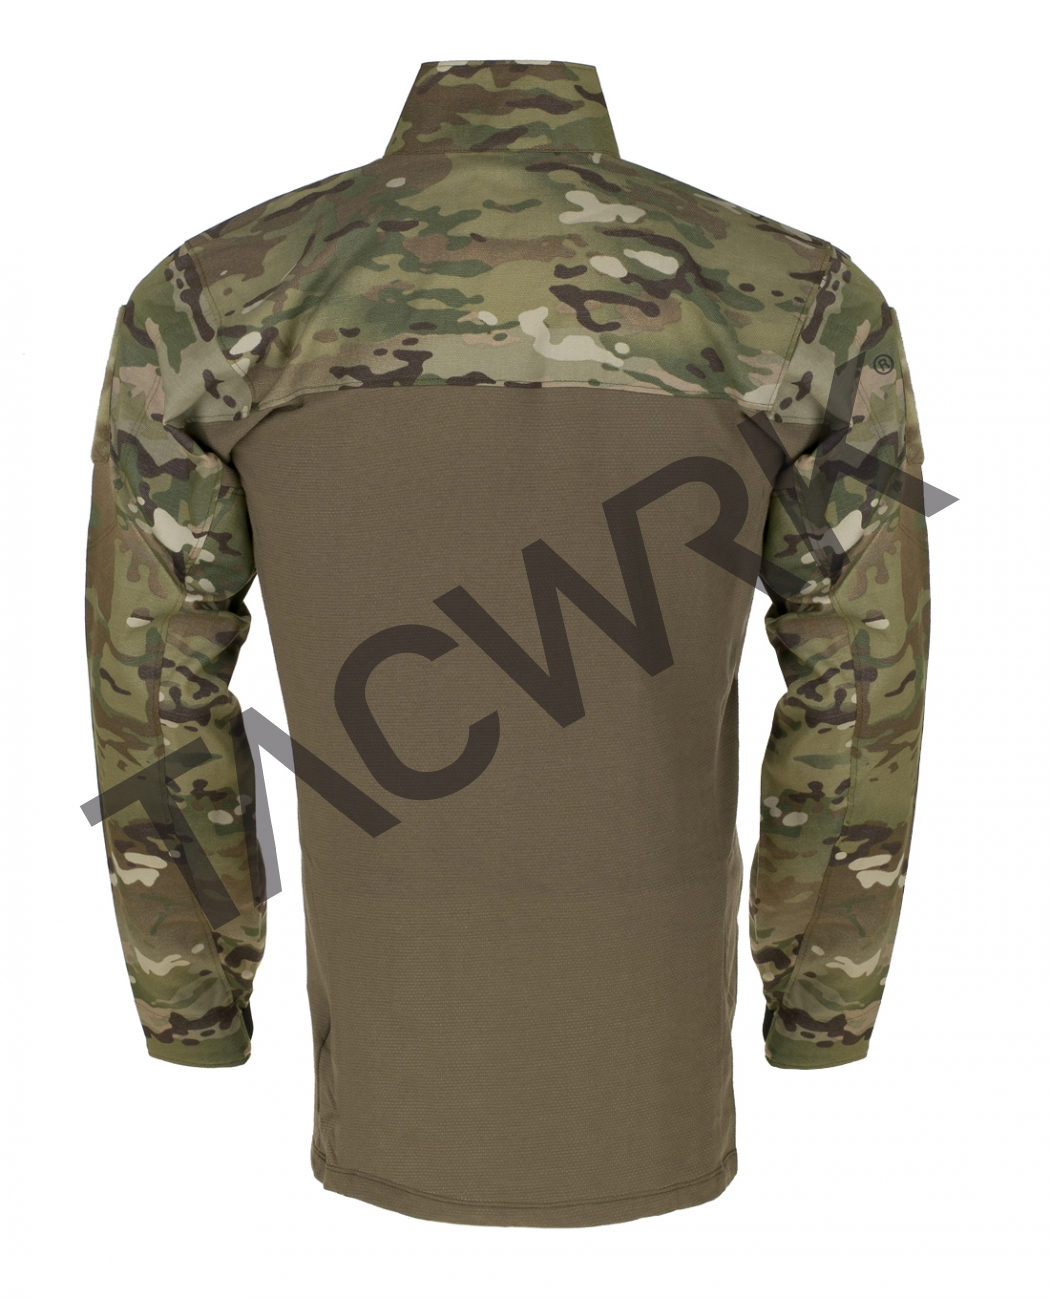 7a014d622dff8 Arc'teryx LEAF Assault Shirt LT Men's MultiCam - TACWRK